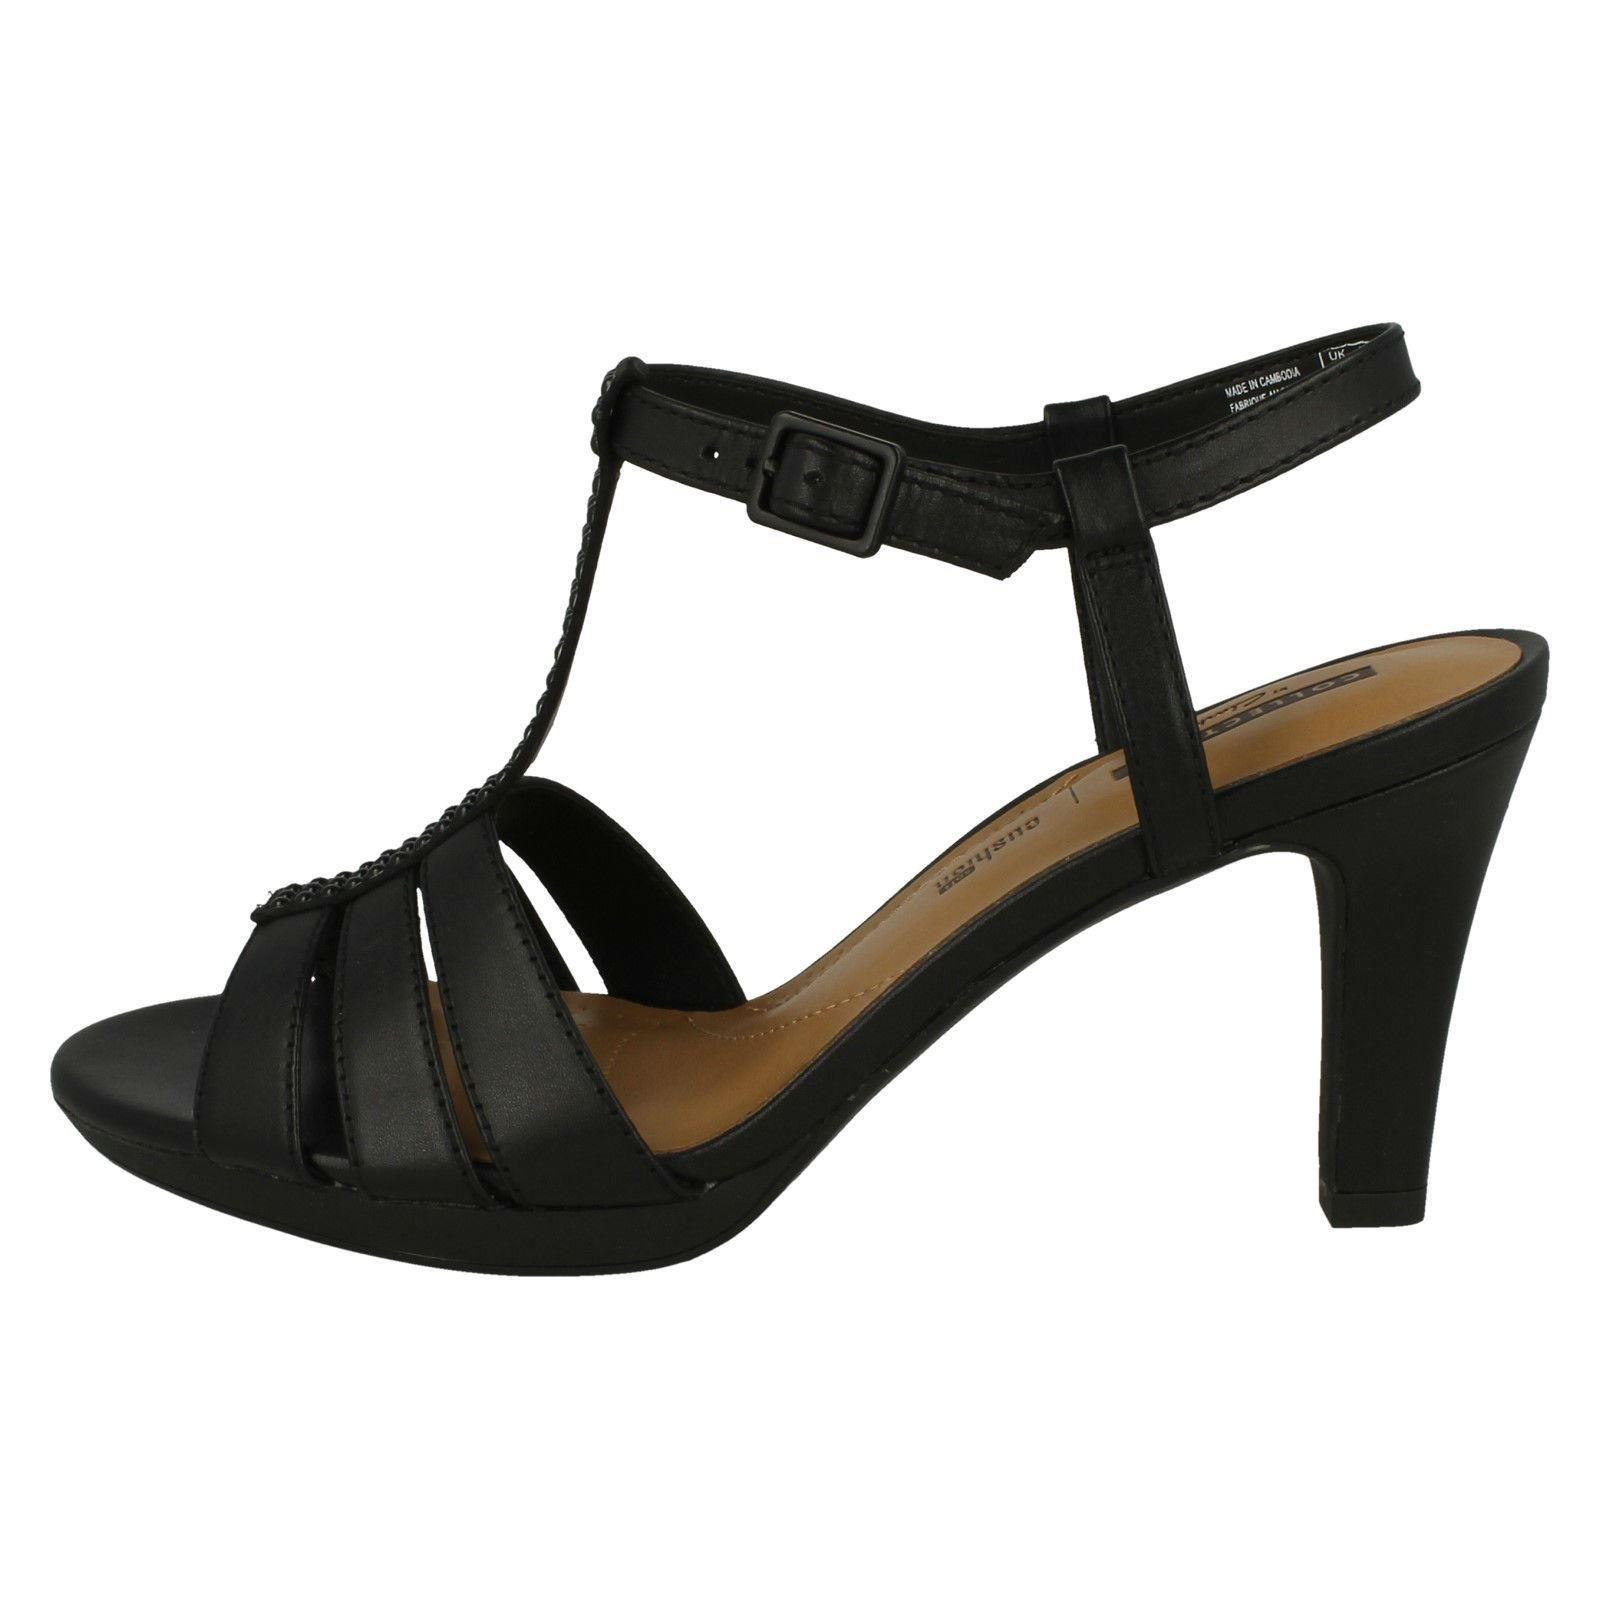 9ce340c994ae Ladies-Clarks-Adriel-Tevis-Slingback-Sandals thumbnail 3